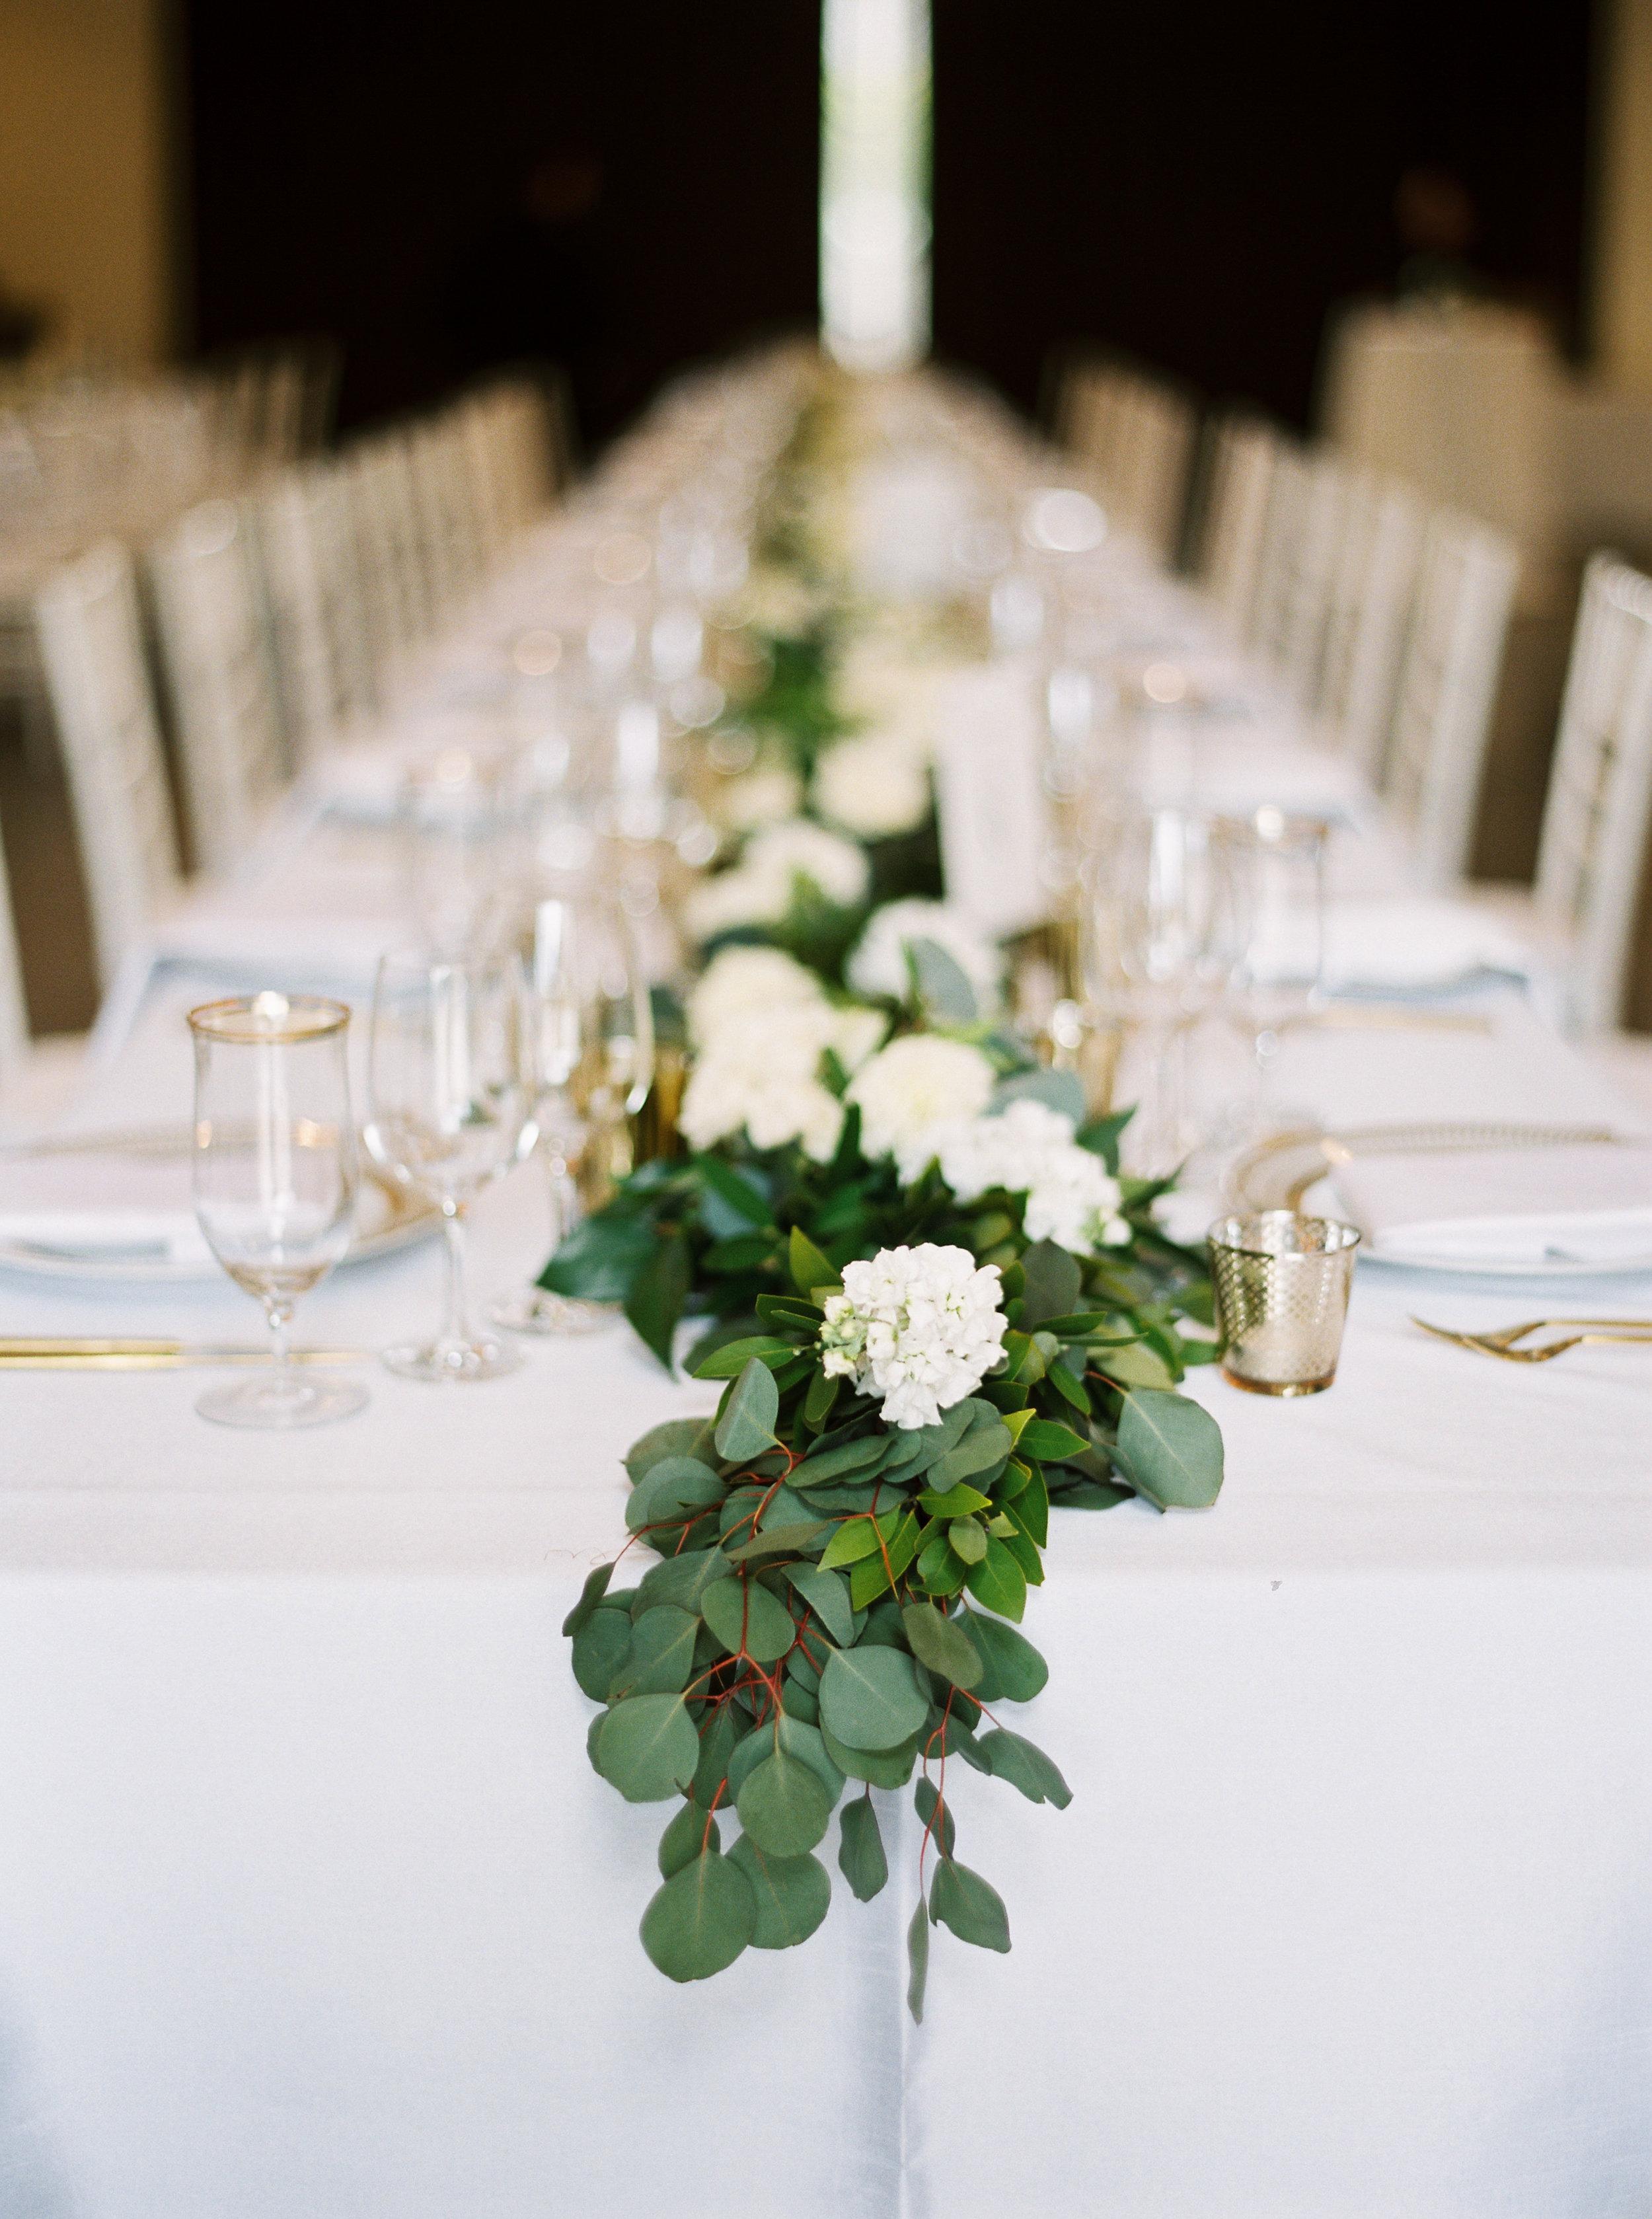 intimate-wedding-at-solage-calistoga-in-napa-175.jpg